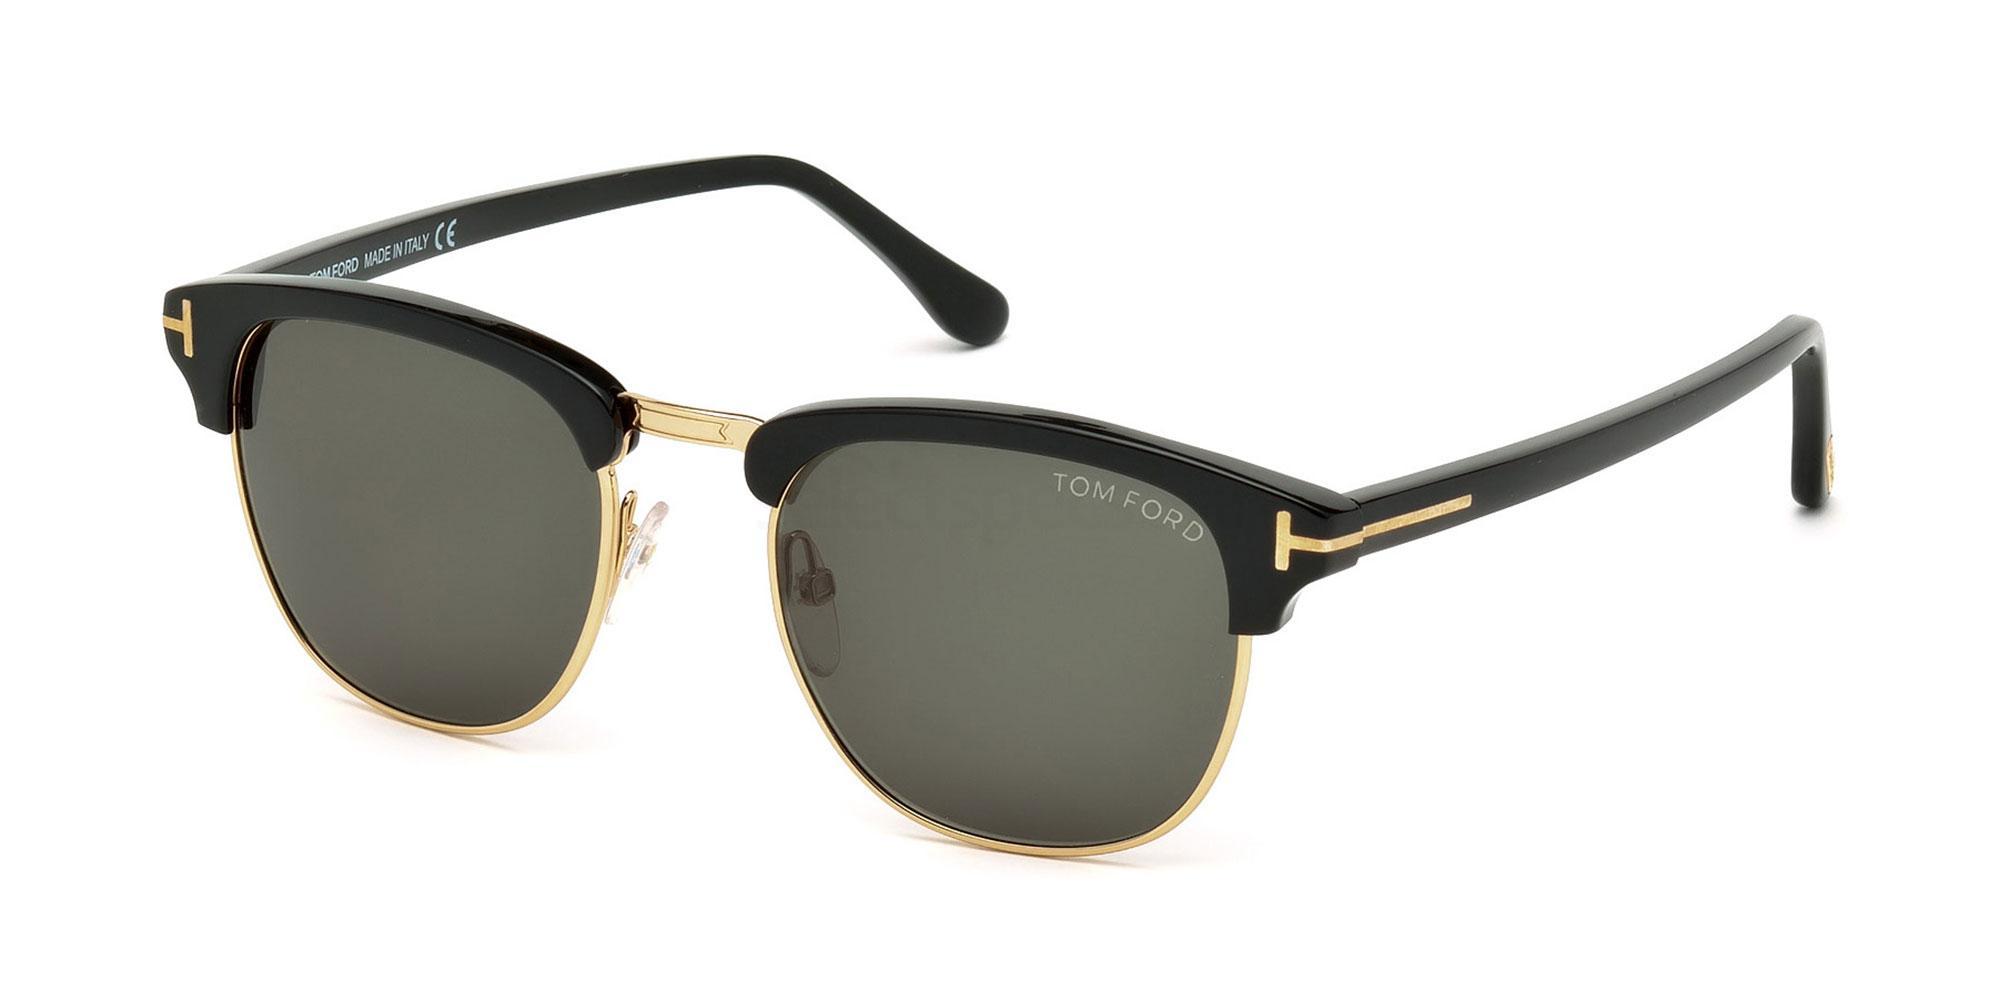 james bond sunglasses tom ford henry valentines gift guide 2021